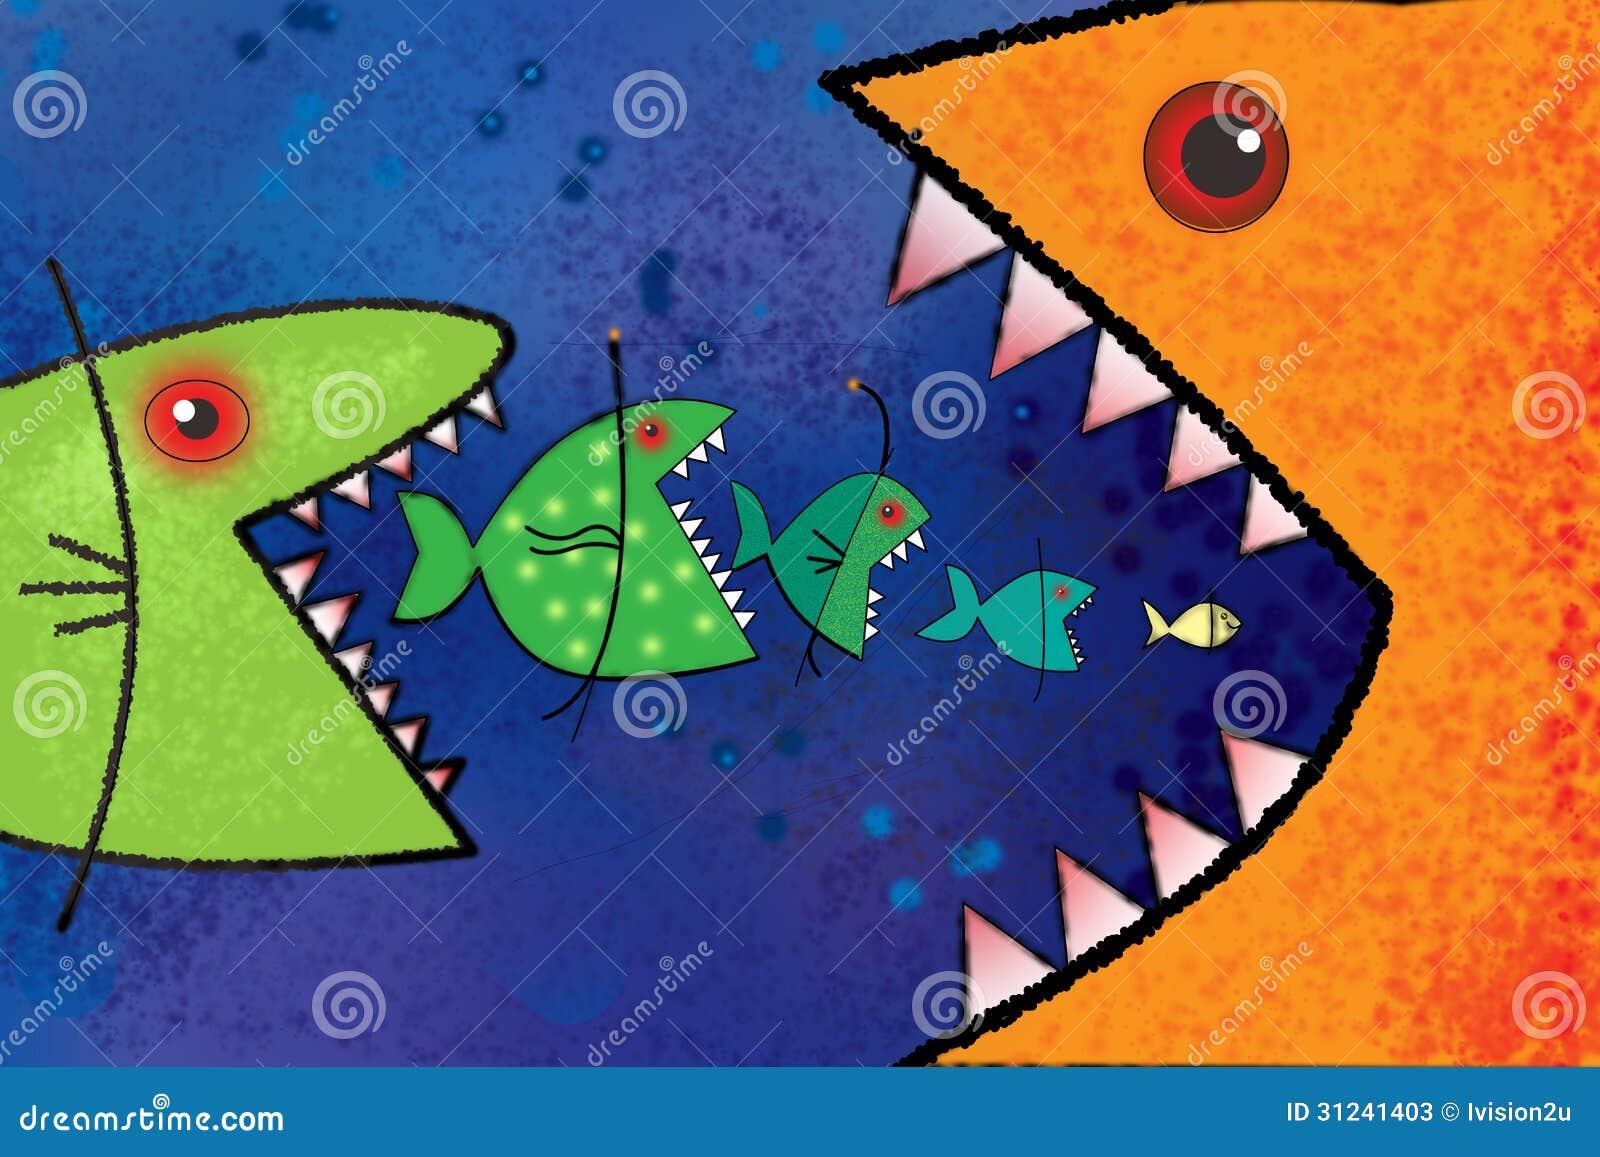 Big fish eat small fish stock photos image 31241403 for Big fish eat small fish